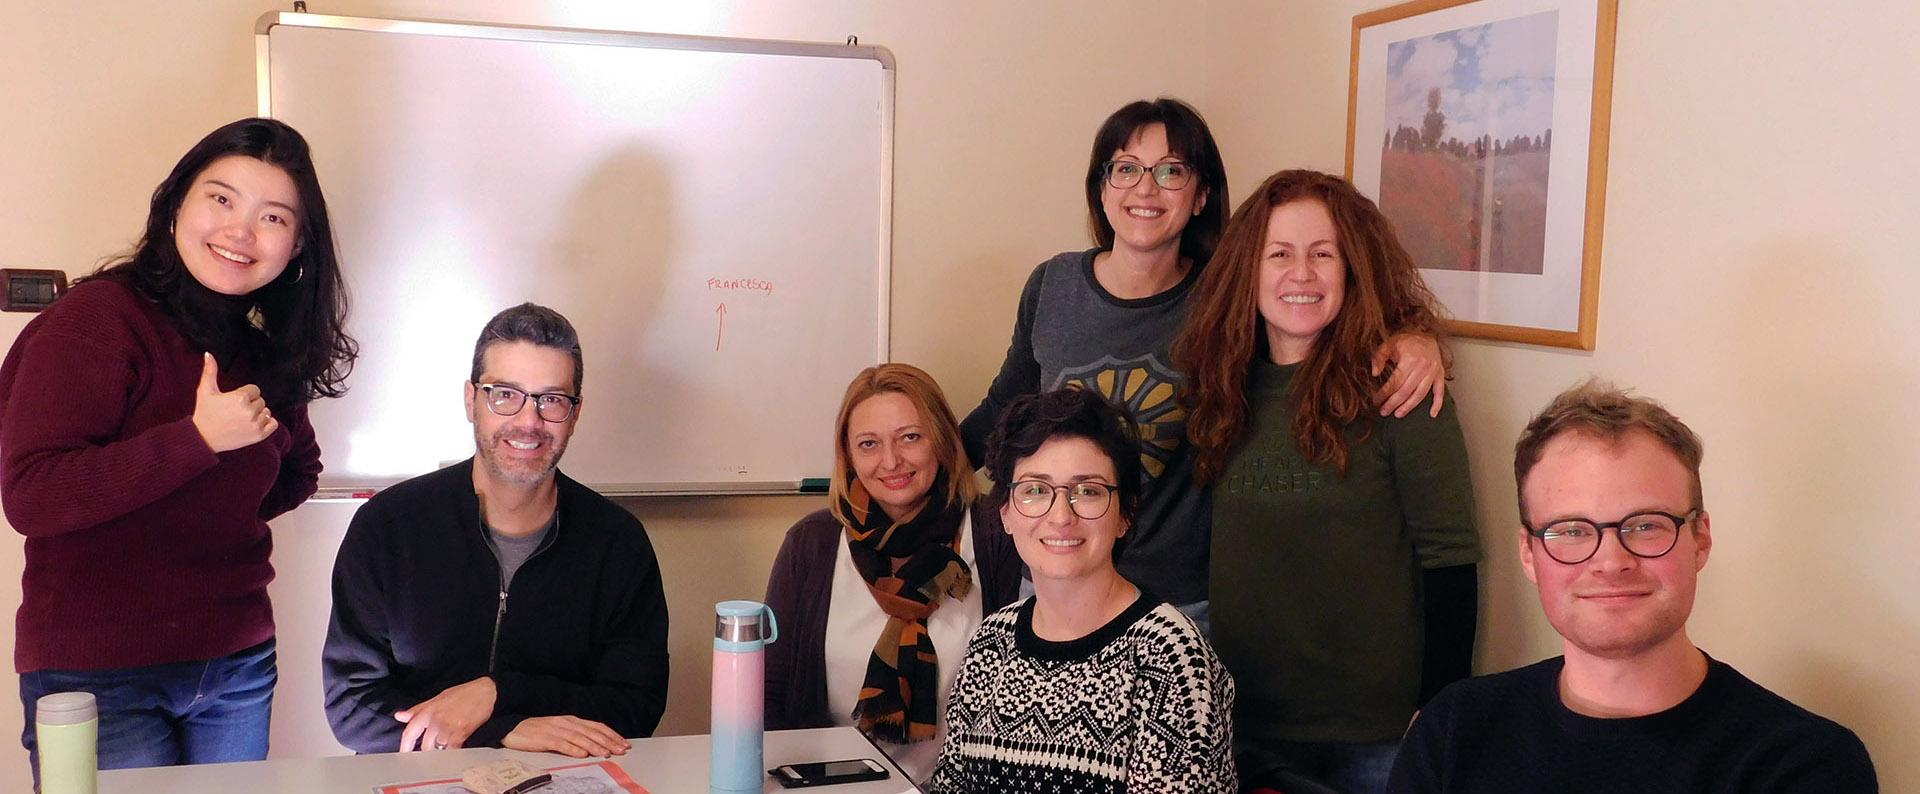 Parola's Italian language students in a class break